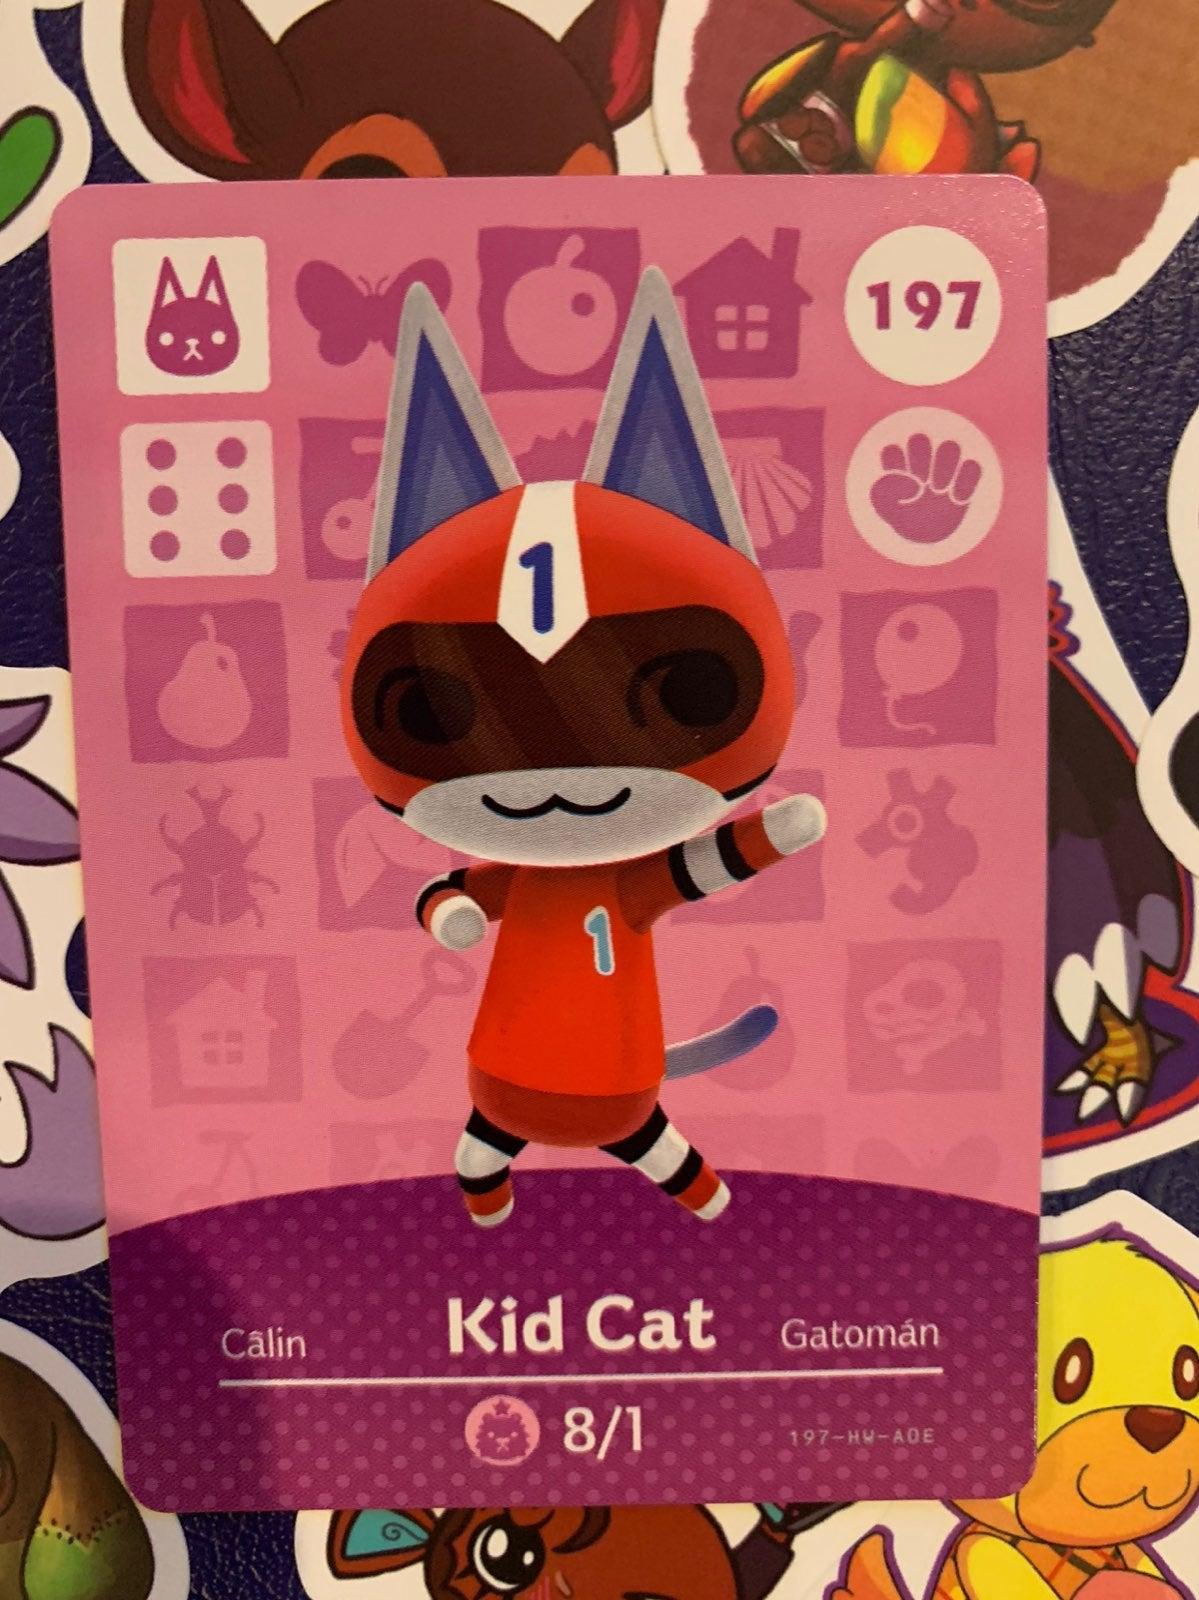 Kid Cat Animal Crossing Amiibo Card